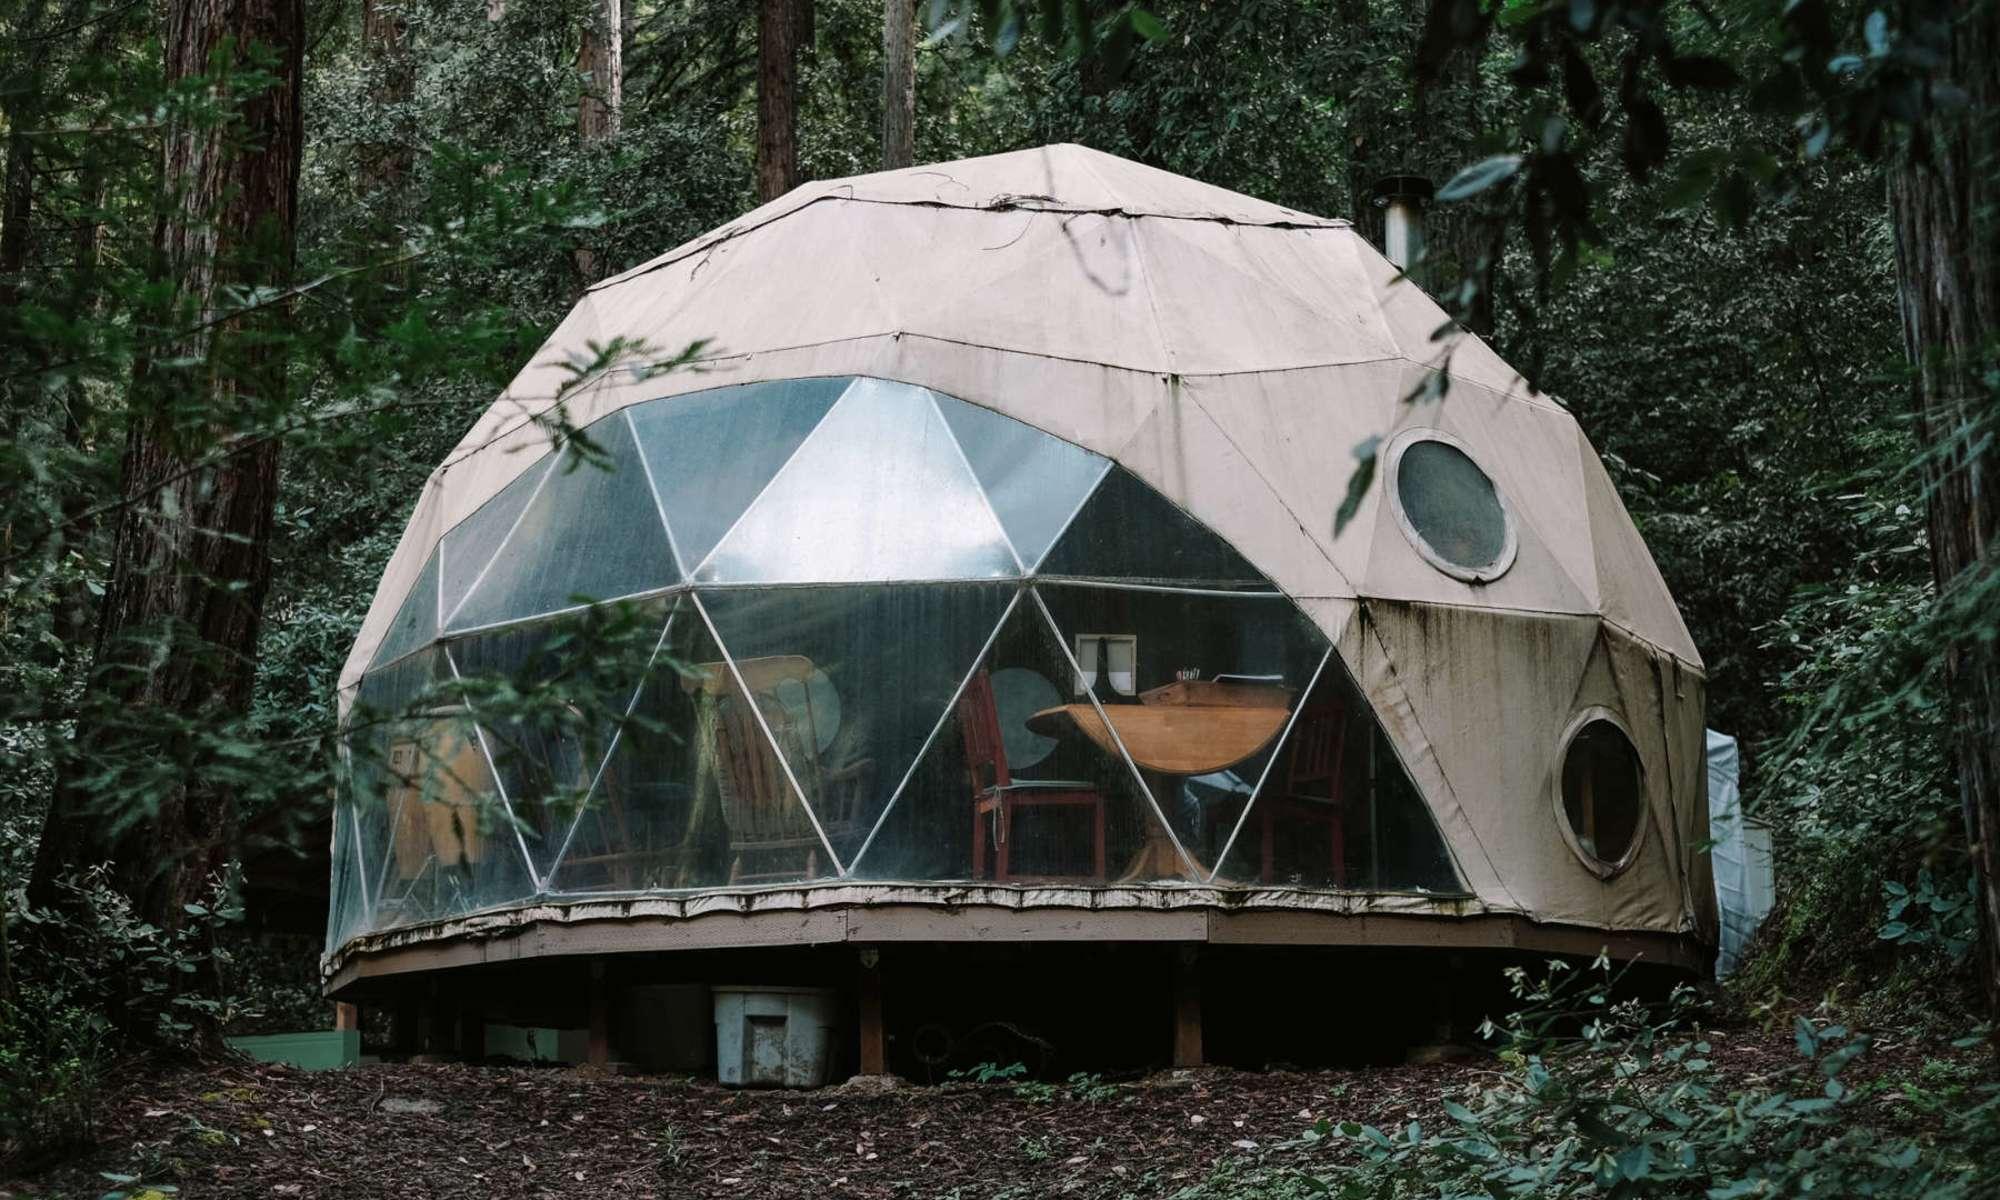 No Tent? No Problem: The Rest of the Lot